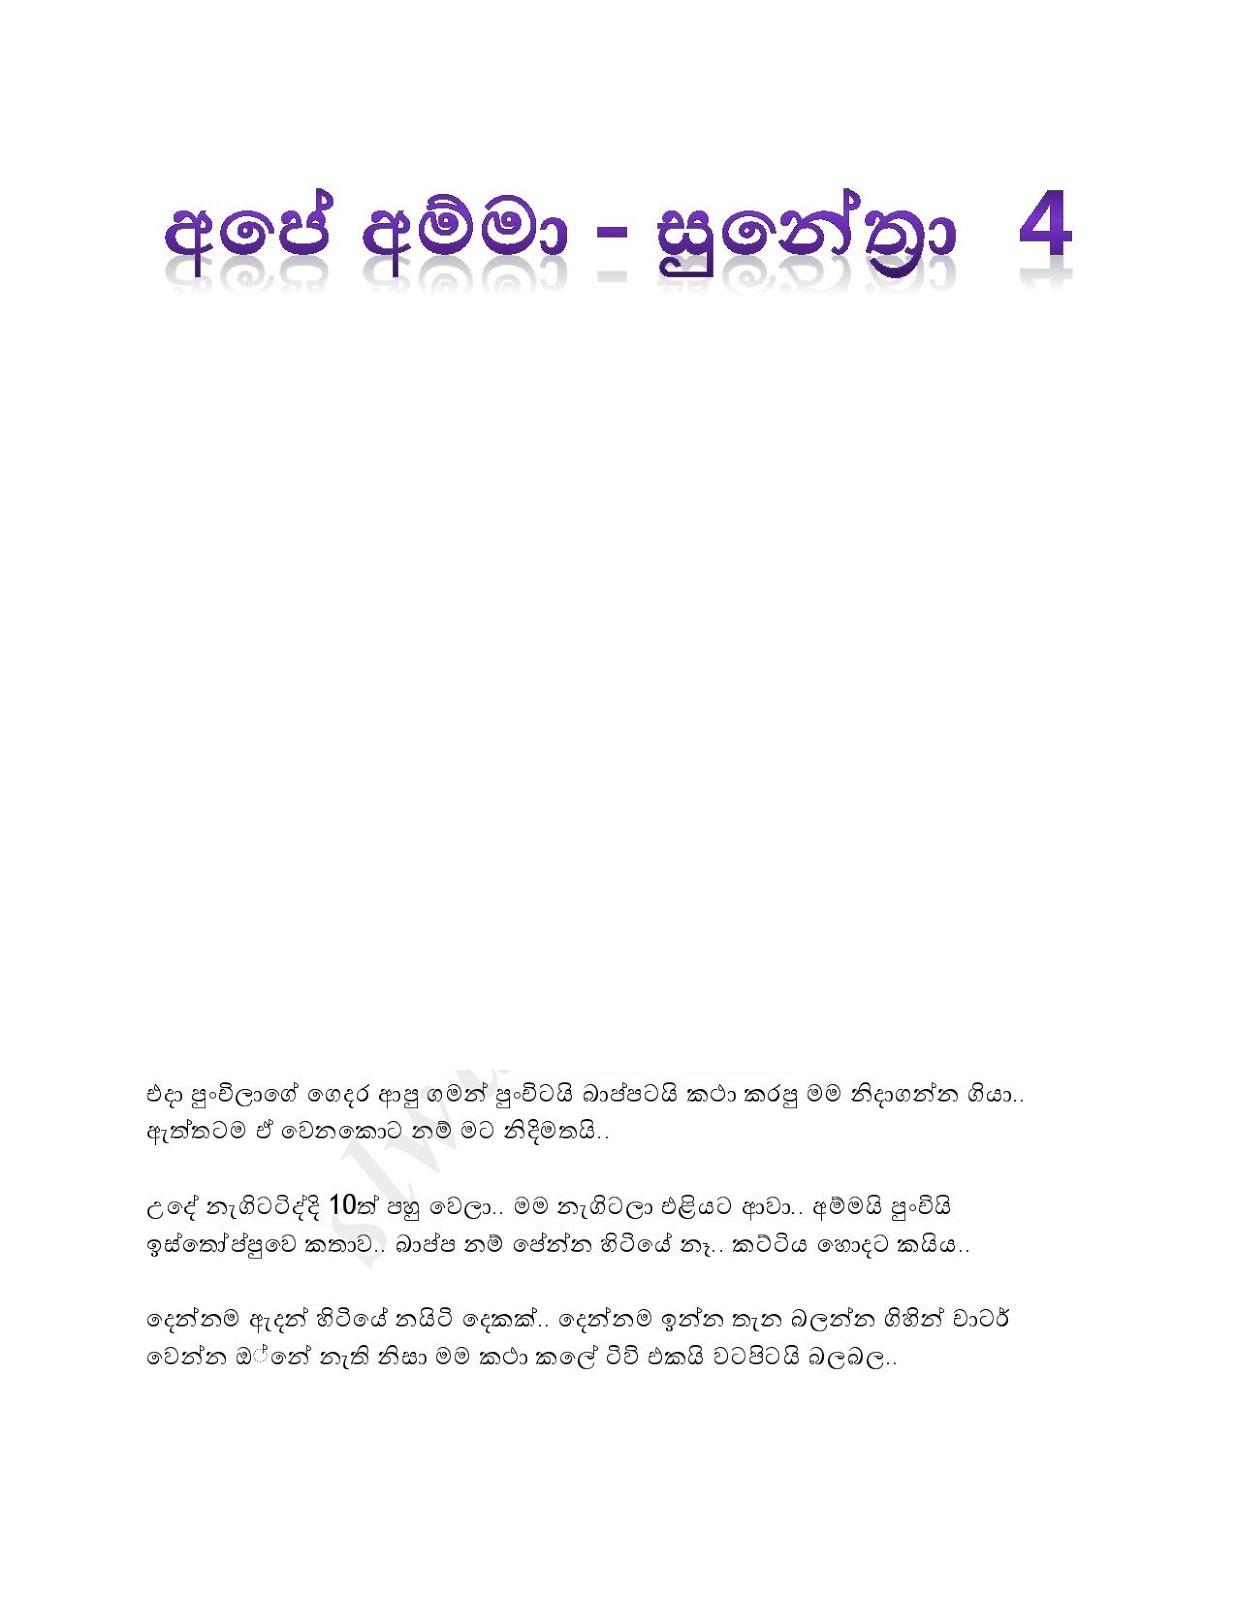 Sinhala Wela Katha 2018 Swimming Class ස්විමිං ක්ලාස්